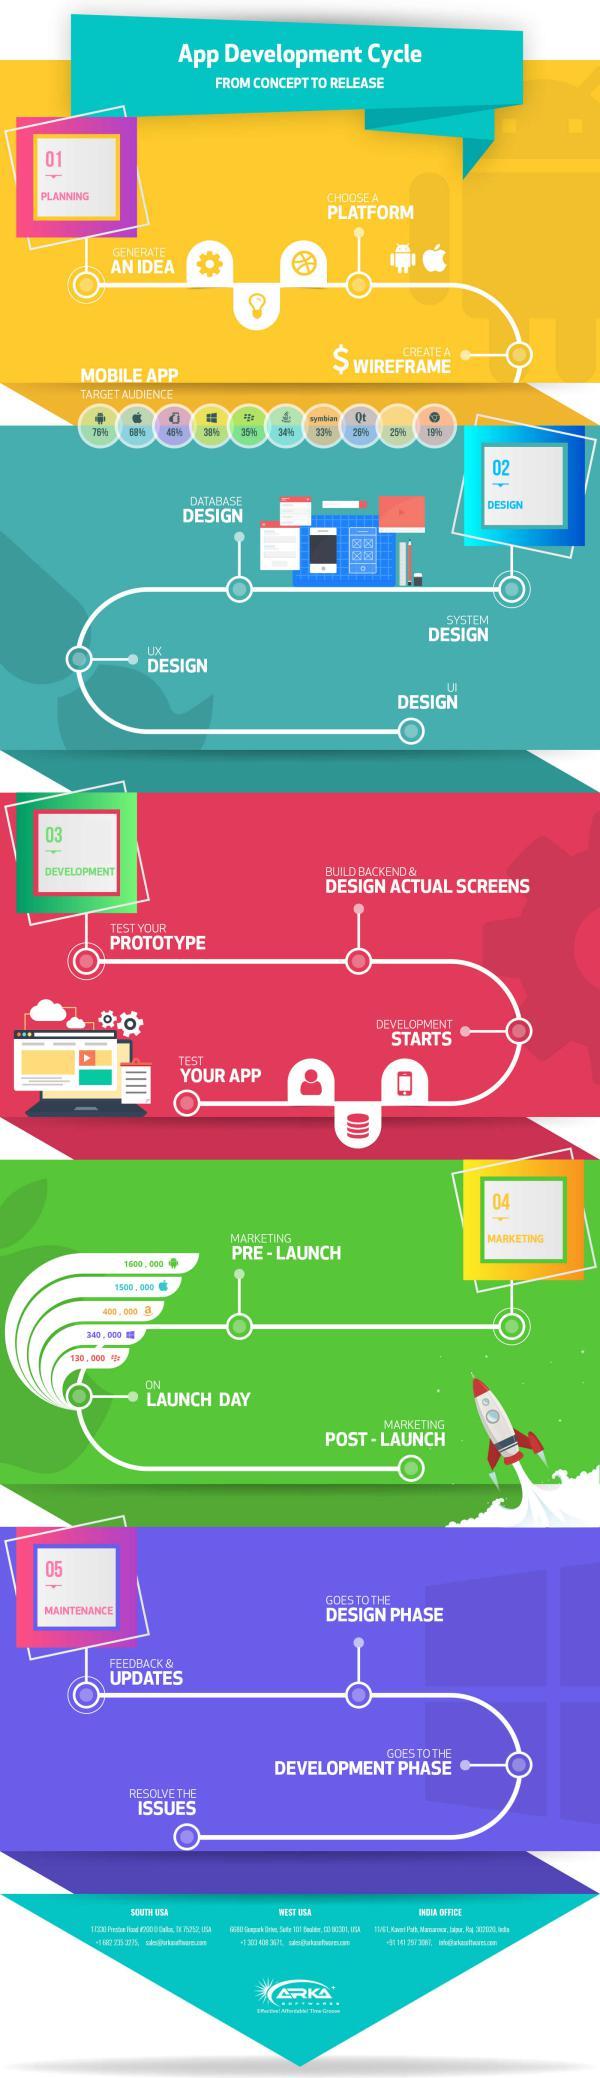 App Development Cycle App Development Cycle